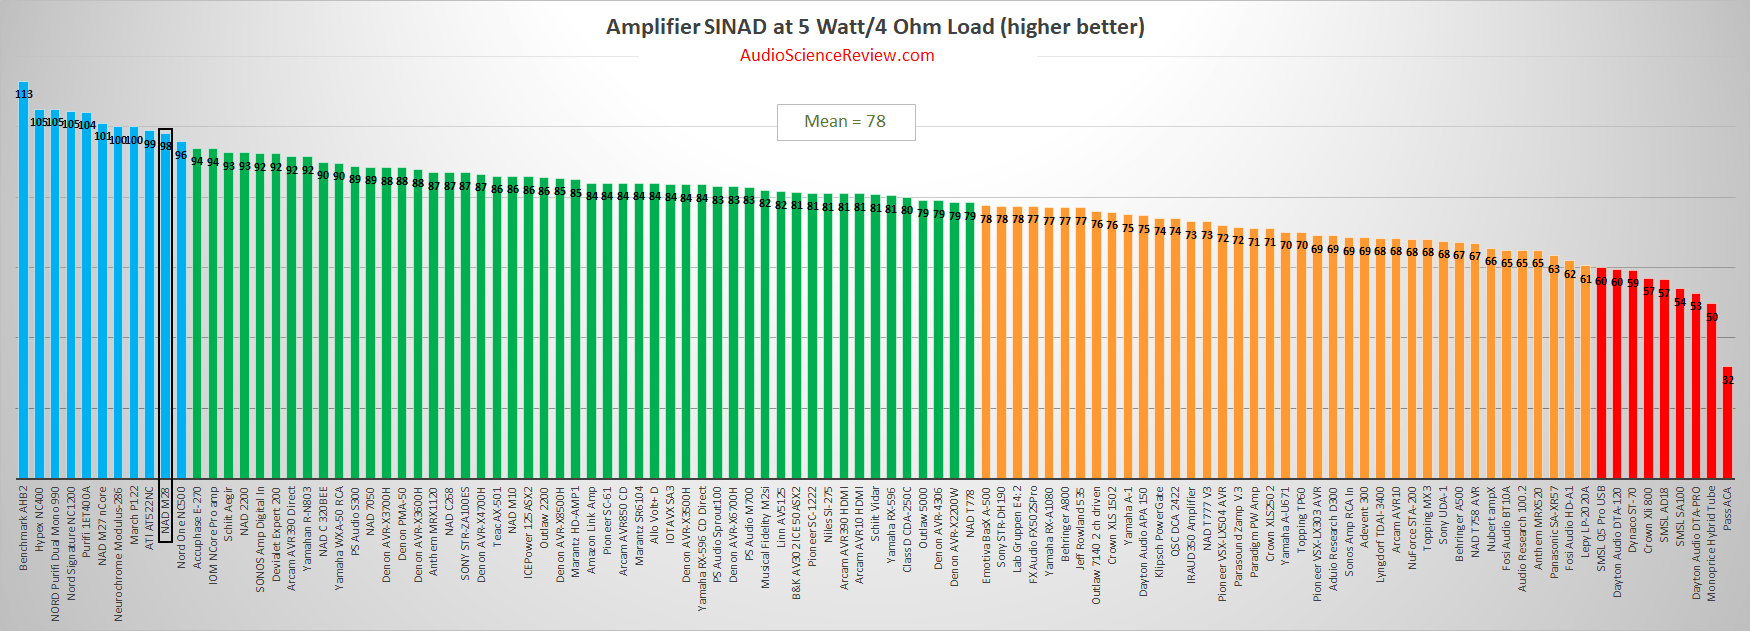 Best multichannel amplifier review 2020.png